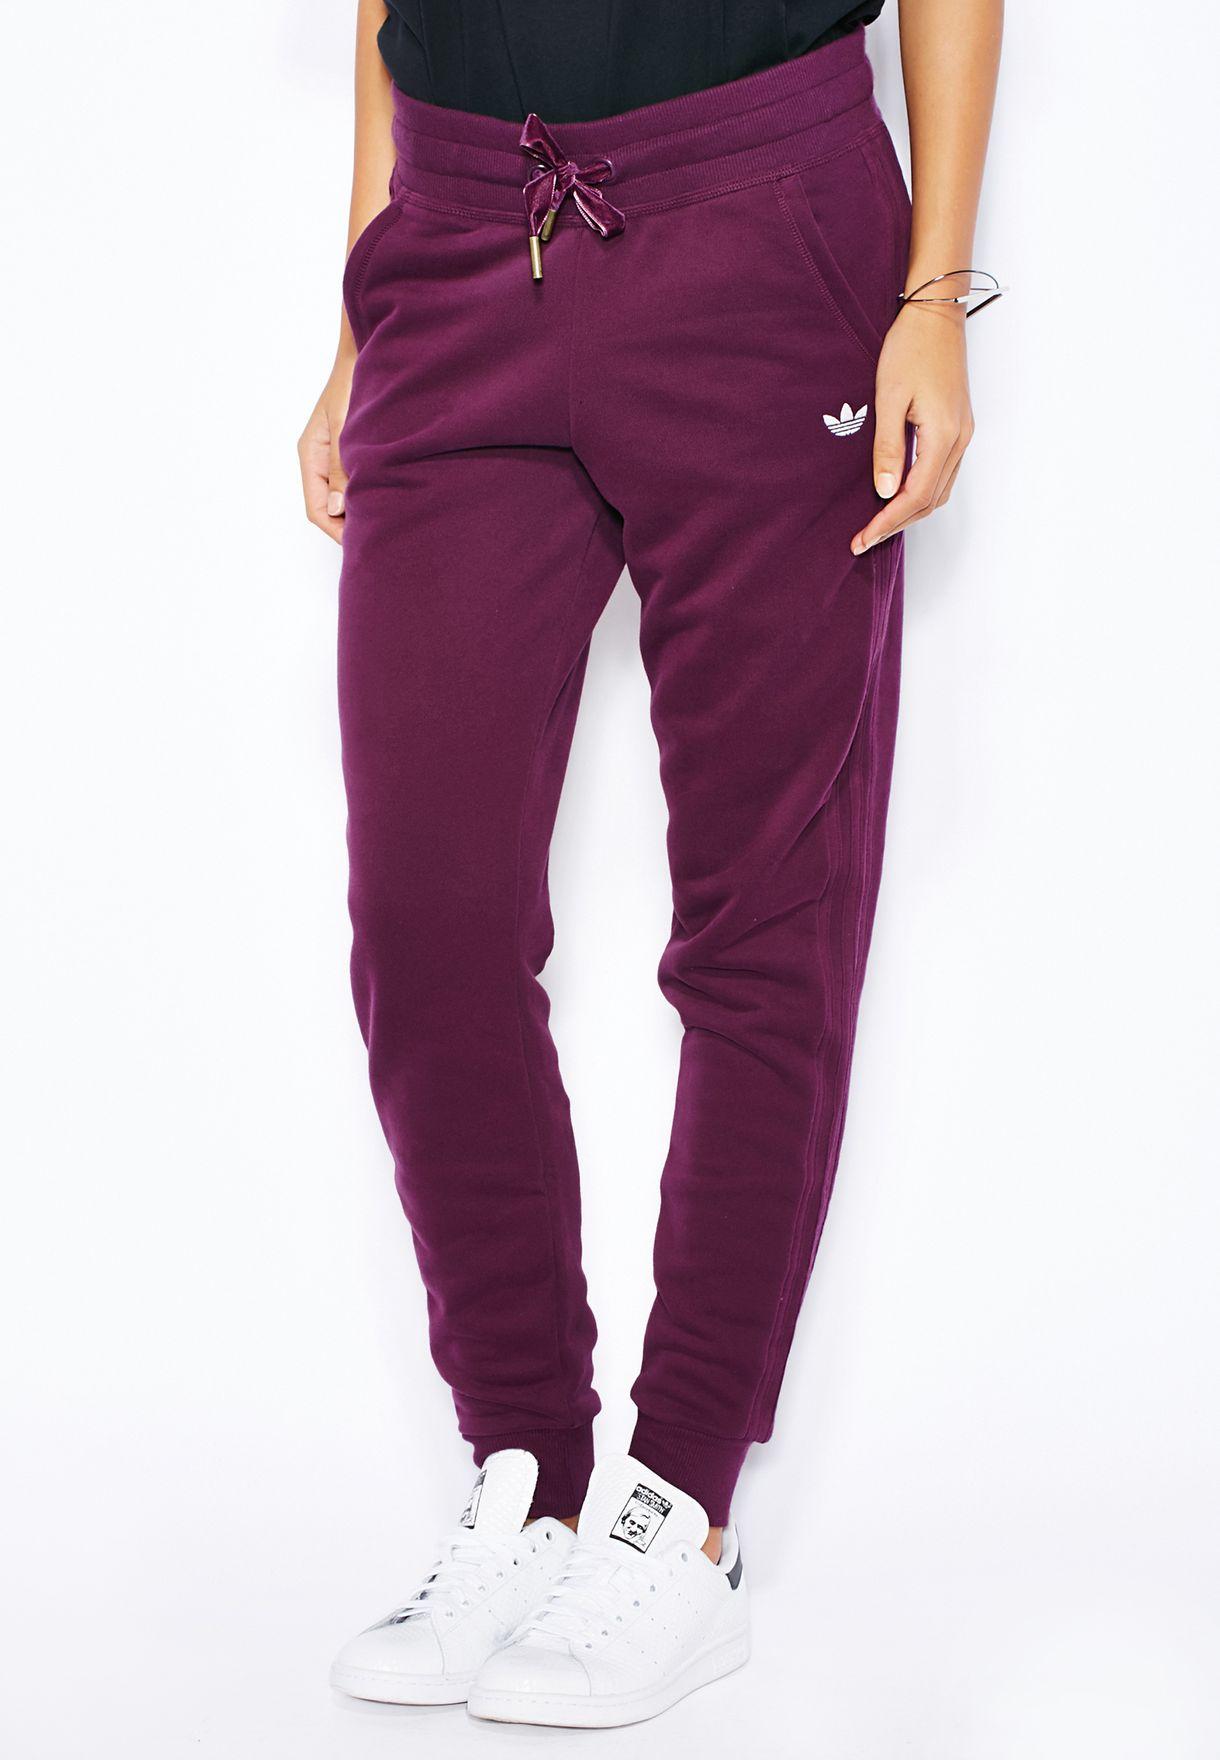 ee5f99bc8e76 Slim Cuffed Track Pants